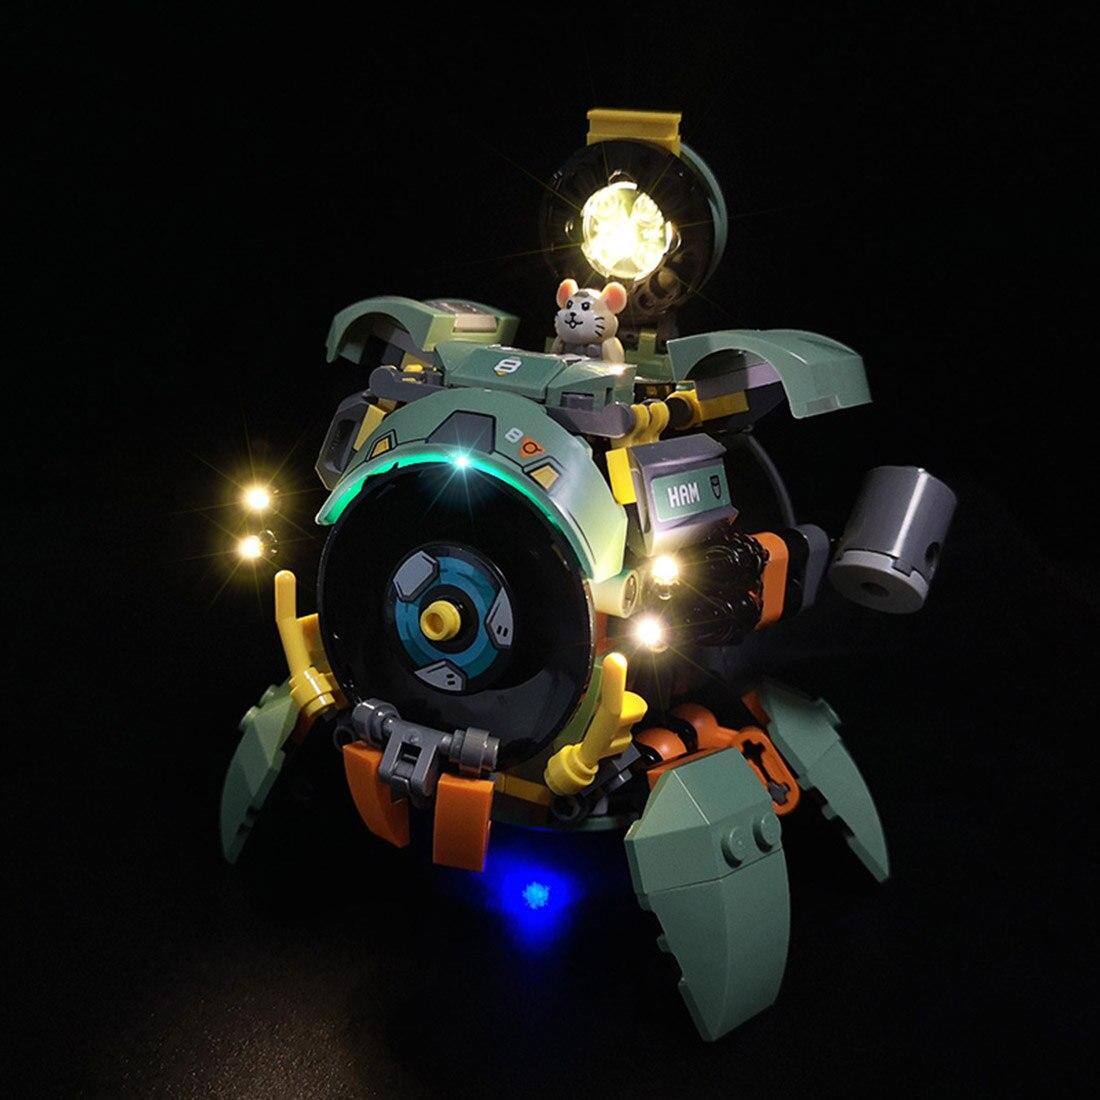 USB Powered LED Lighting Kit For Overwatch Wrecking Ball 75976 (LED Included Only, No Kit)For Children Kid Educational Toys Gift